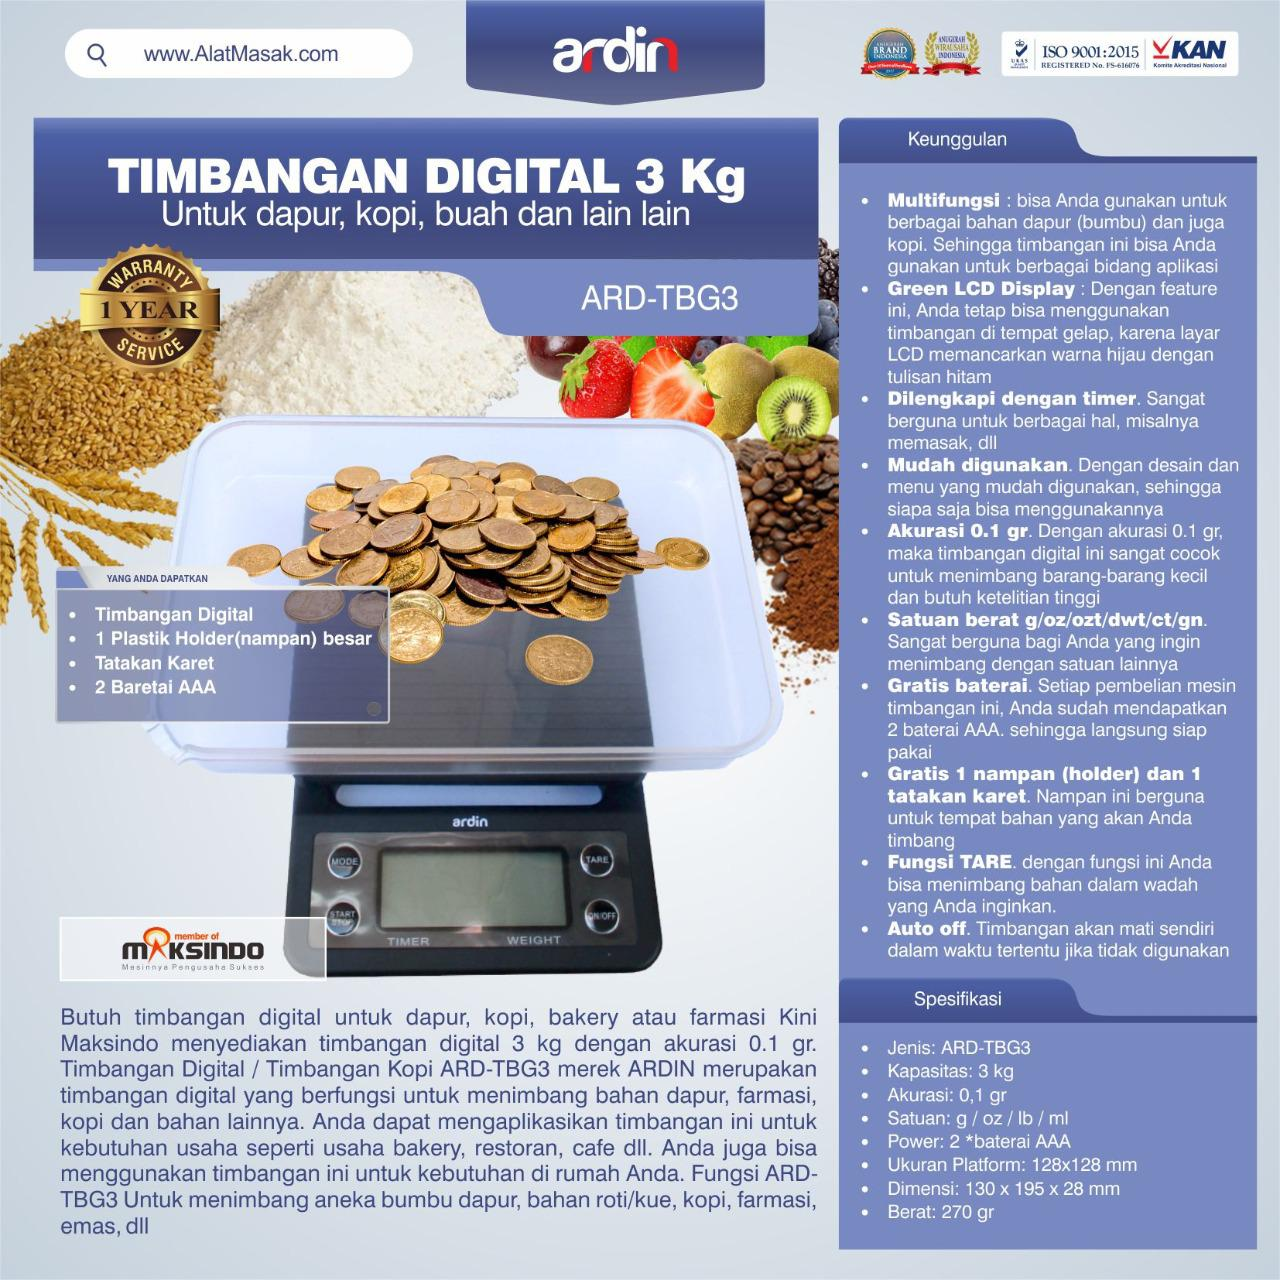 Jual Timbangan Digital 3 kg / Timbangan Kopi ARD-TBG3 di Yogyakarta